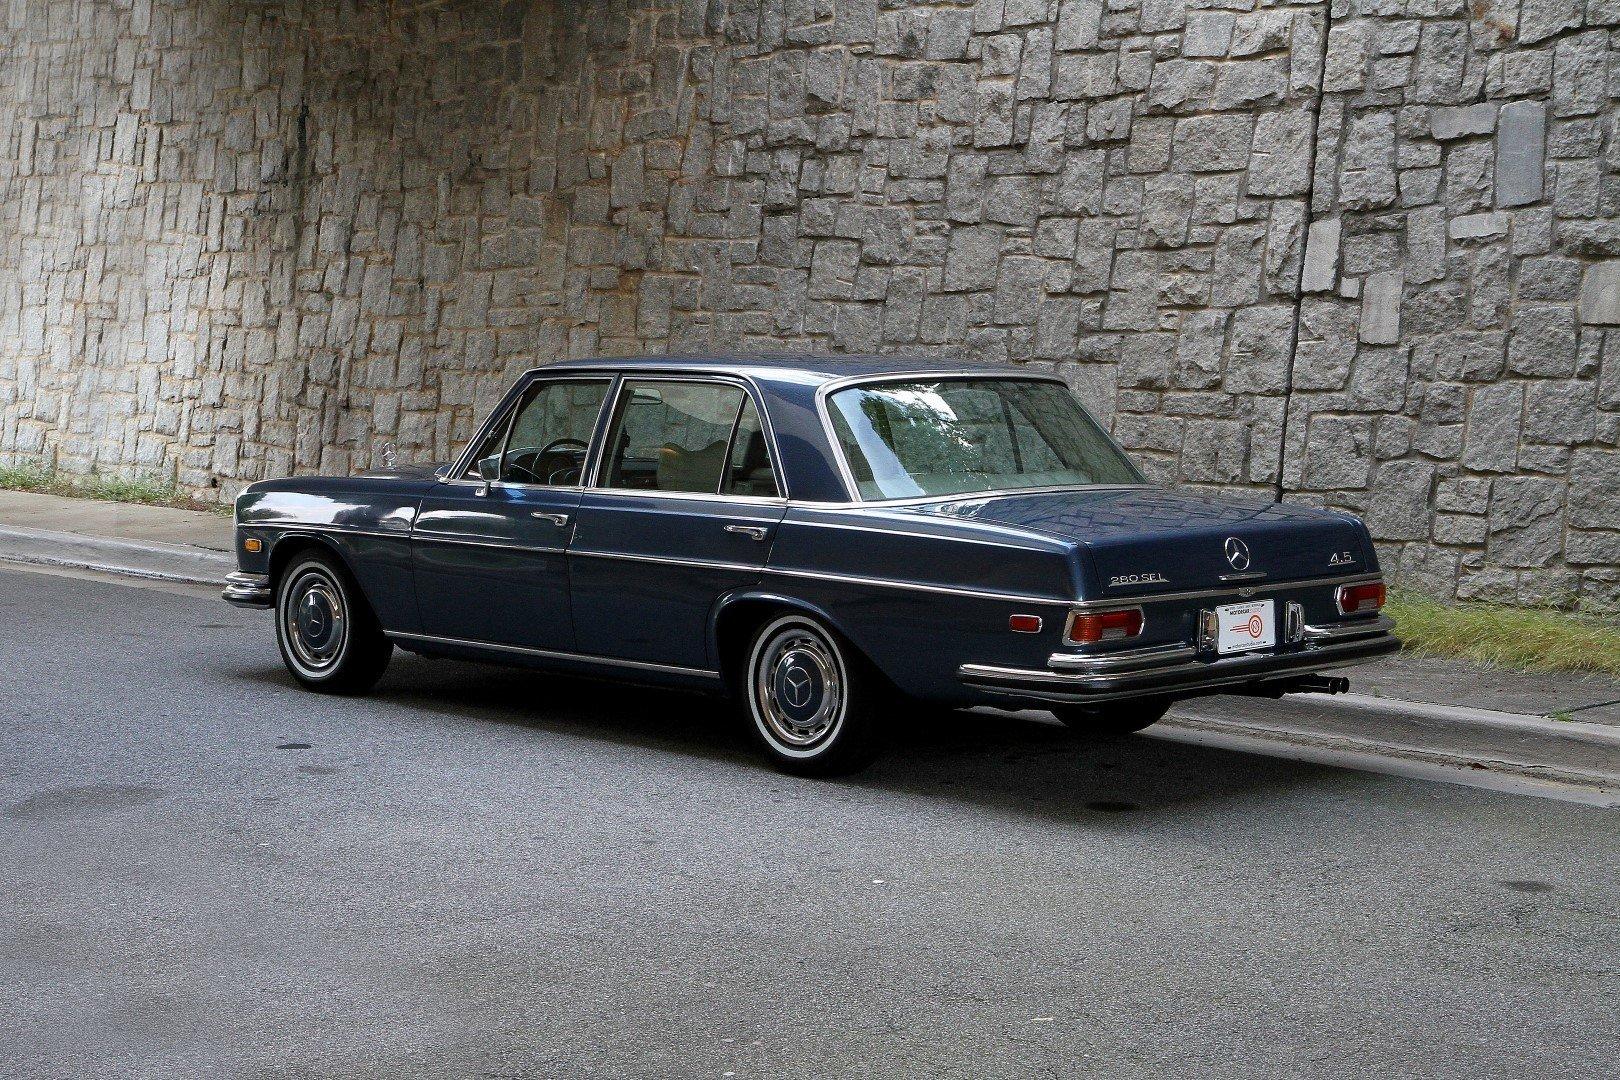 1973 mercedes benz 280sel for sale 91280 mcg for Mercedes garage 93